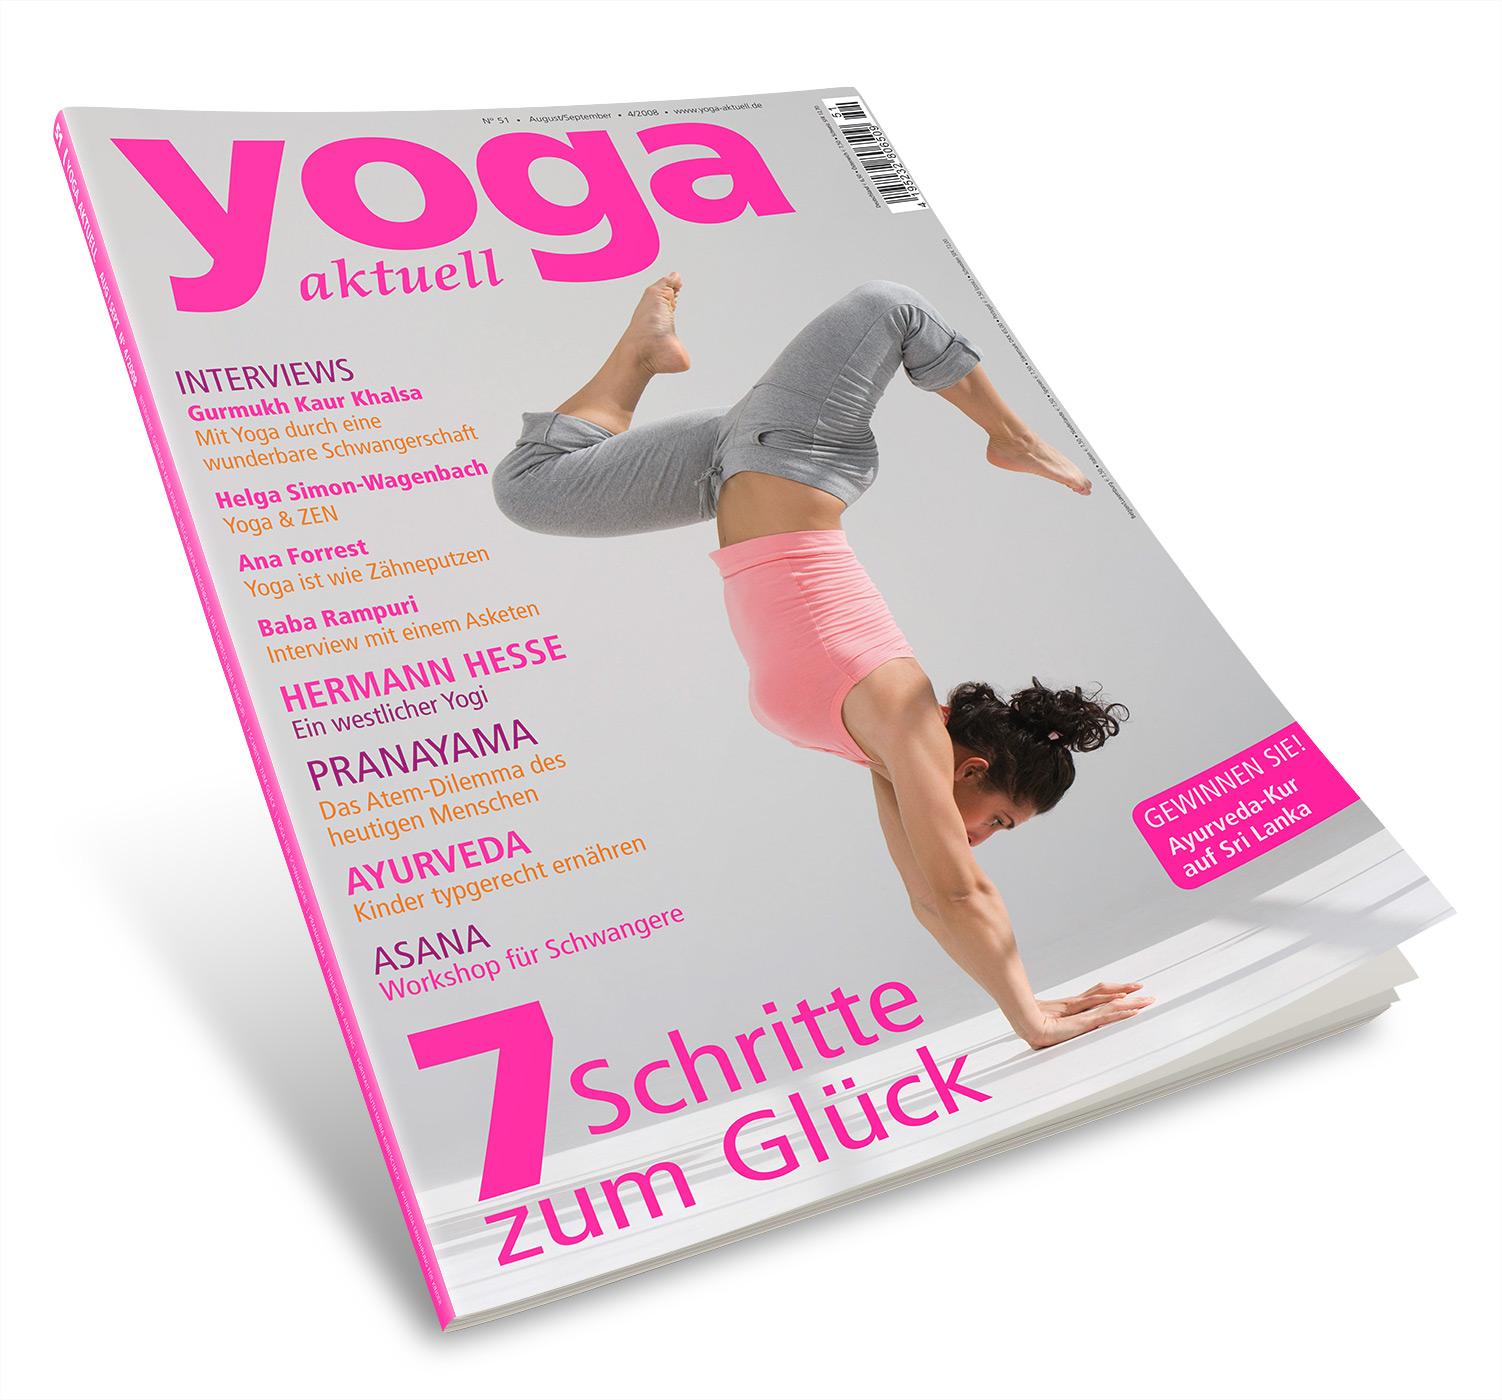 Yoga Aktuell 51 - 04/2008